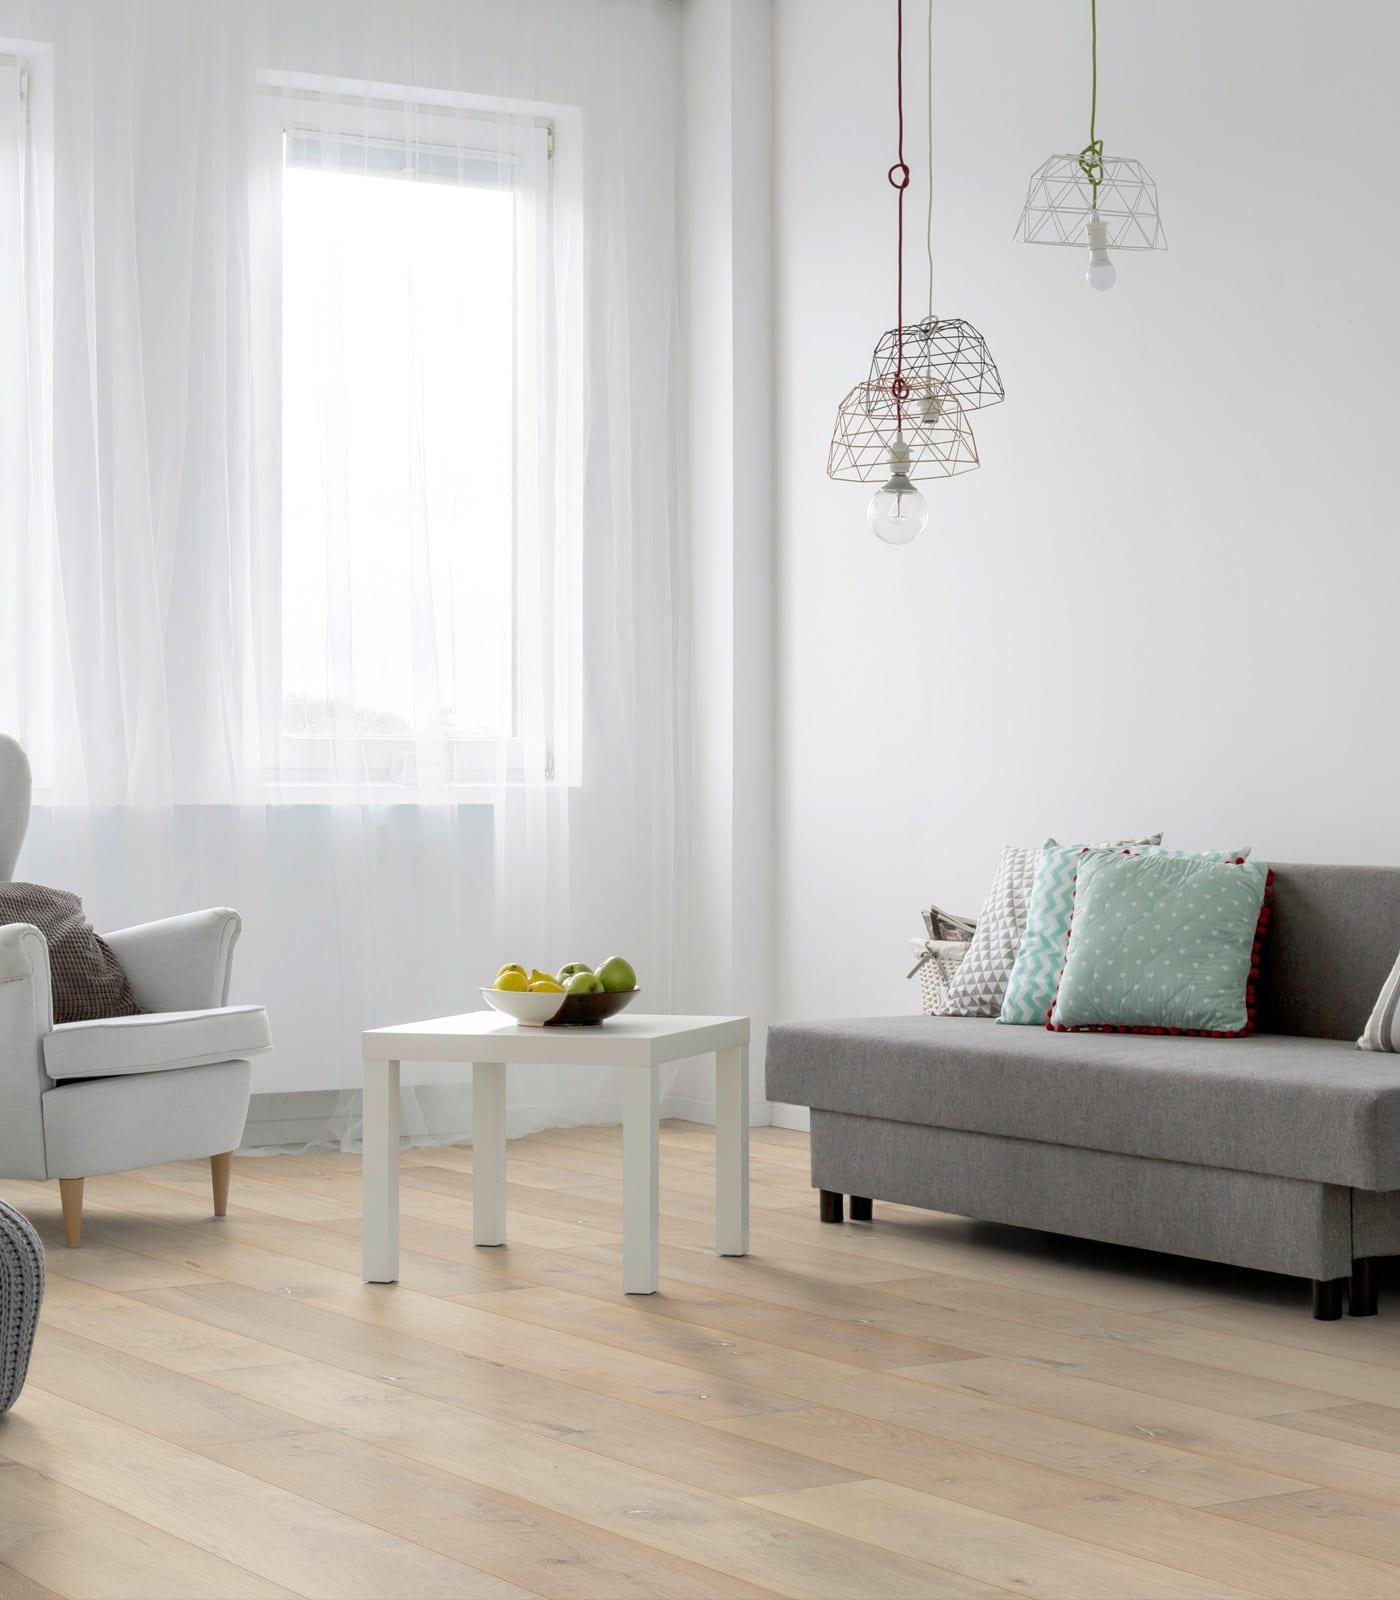 Aspen-Lifestyle Collection-European Oak Floors-room